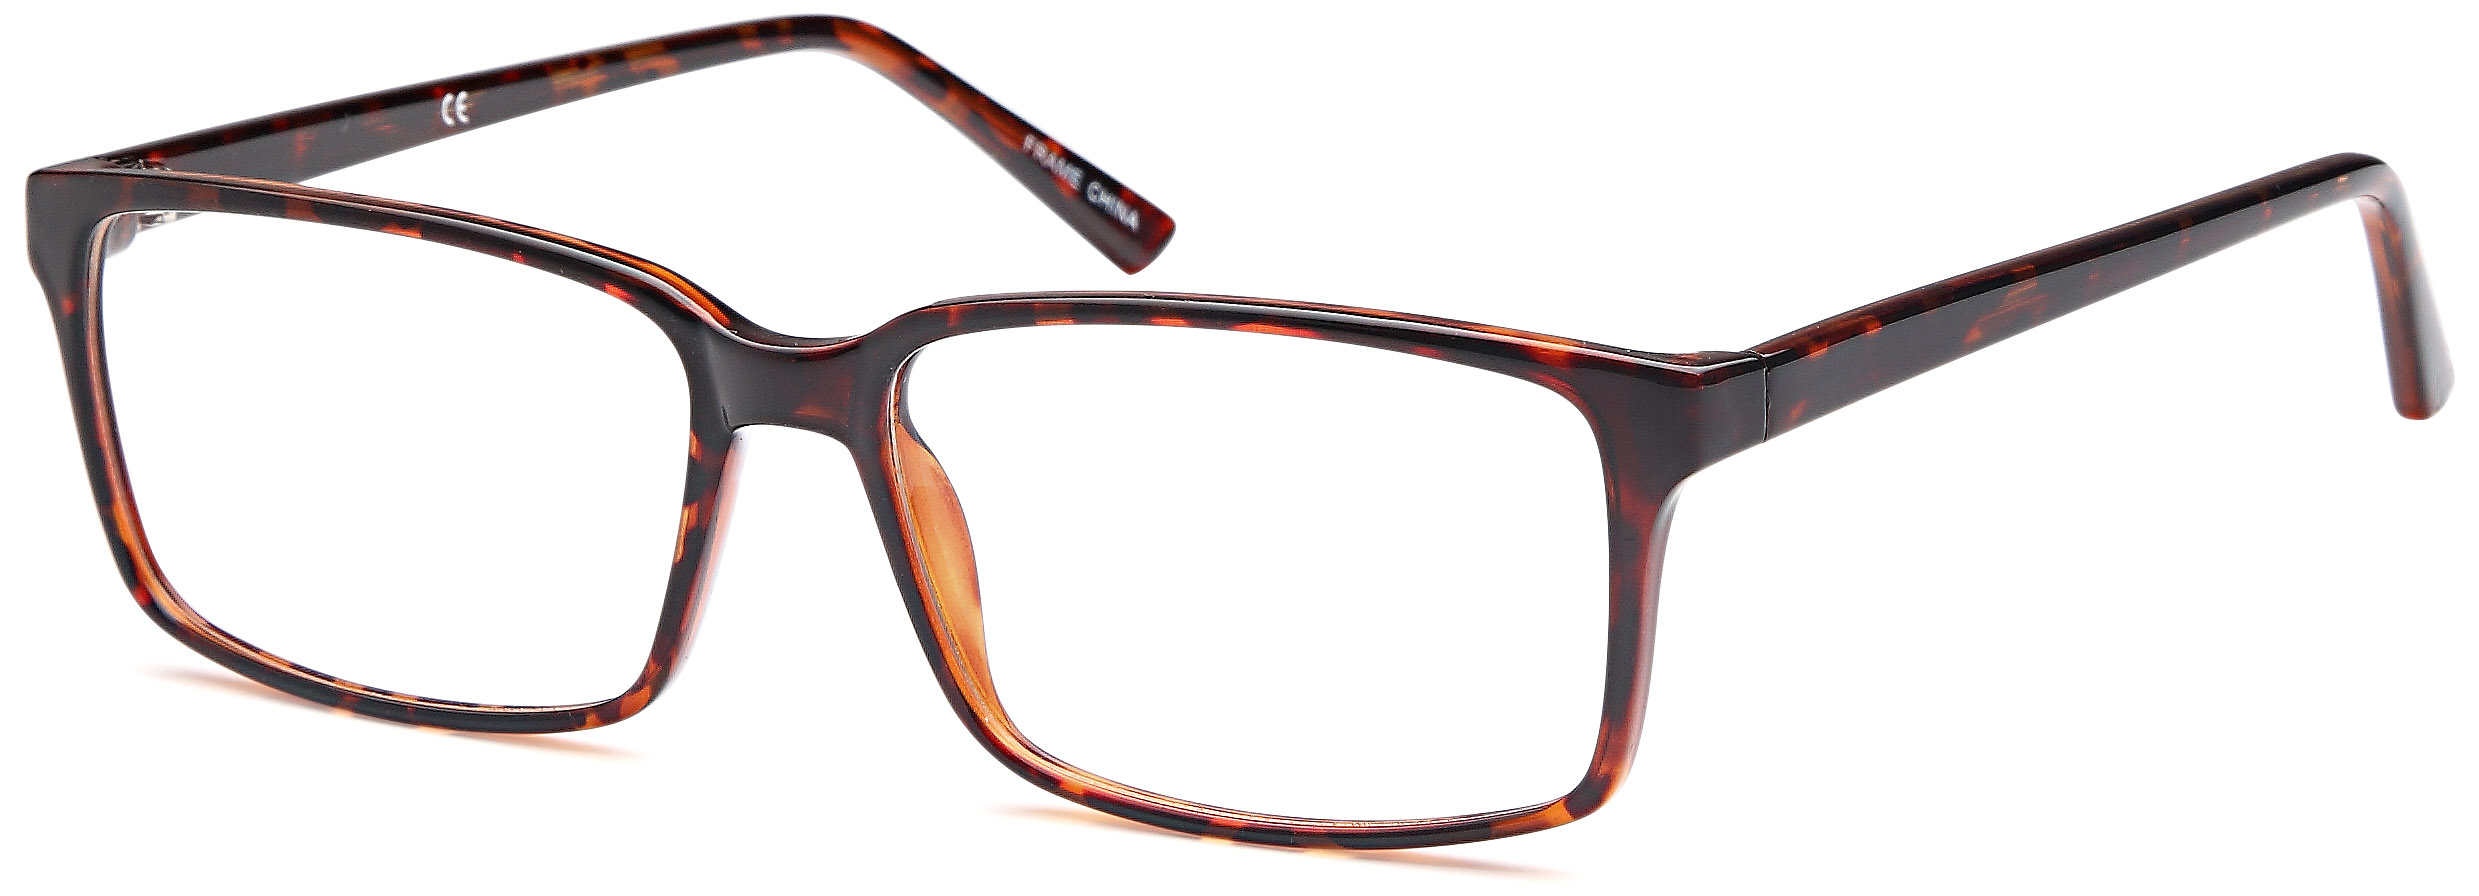 DALIX Womens Eyeglasses Frames 60-16-145-39 RXable in ...